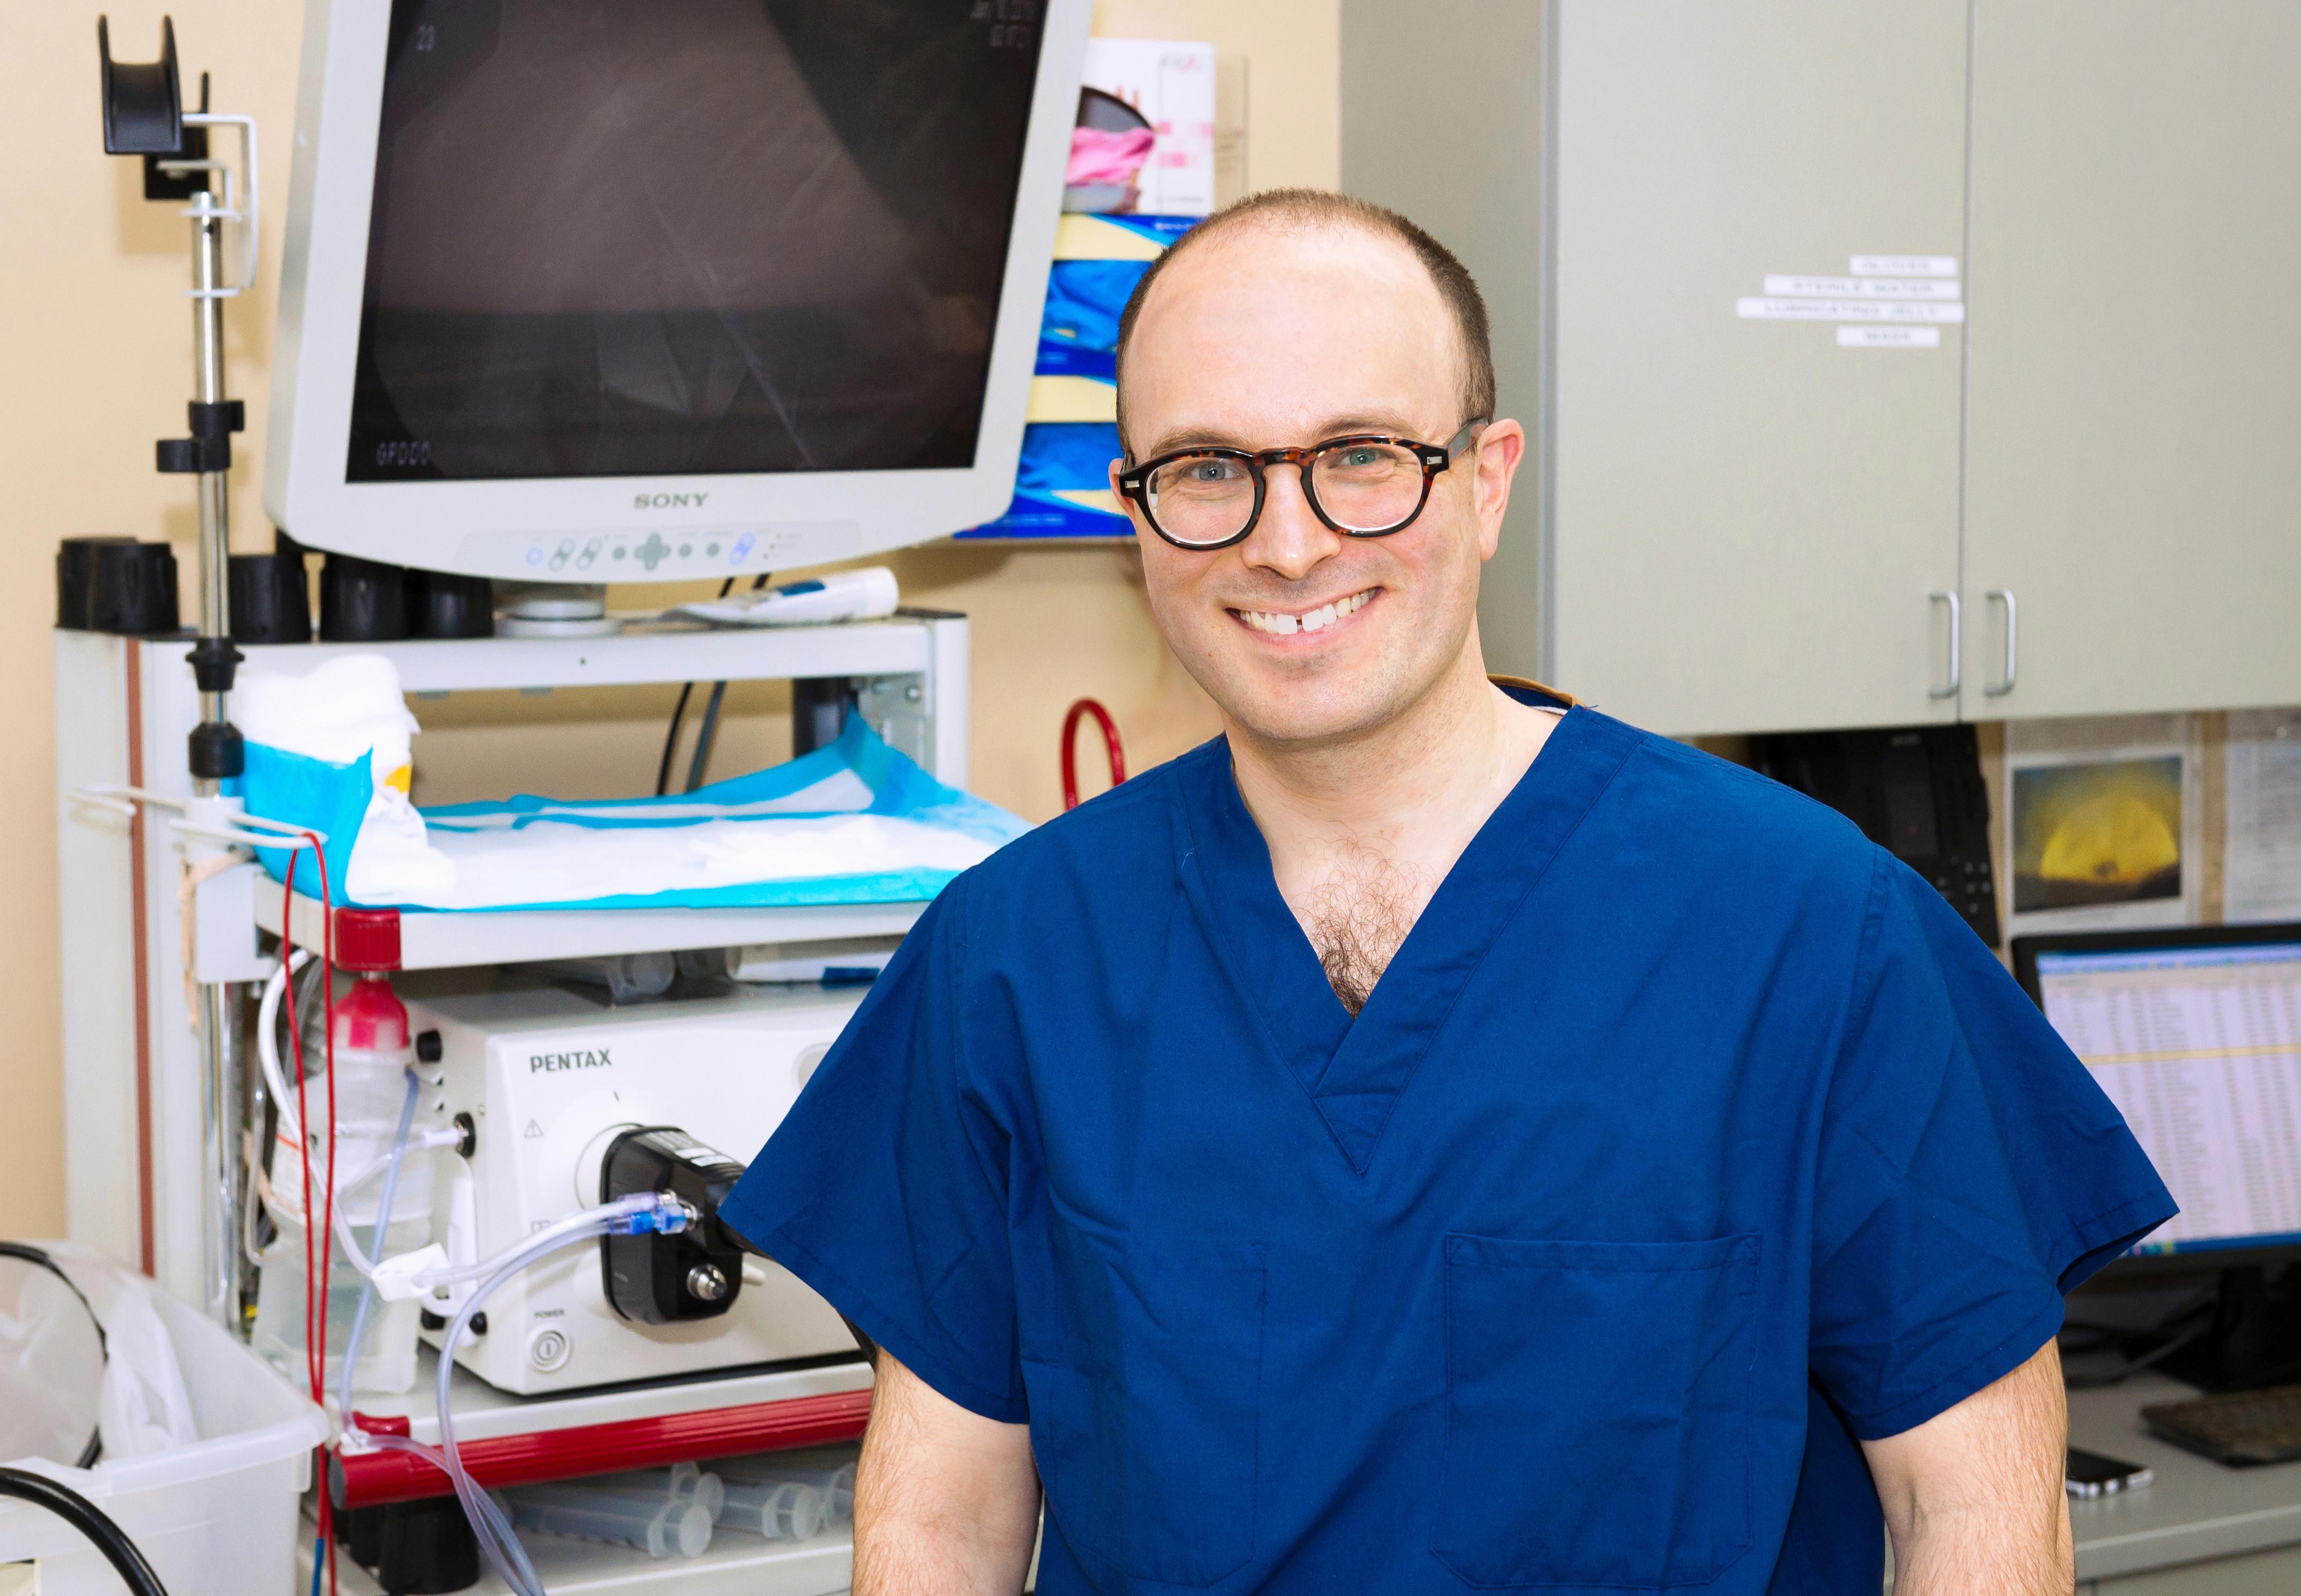 About   Dr  Charles Oliner, NYC Gastroenterology   Obalon Doctor